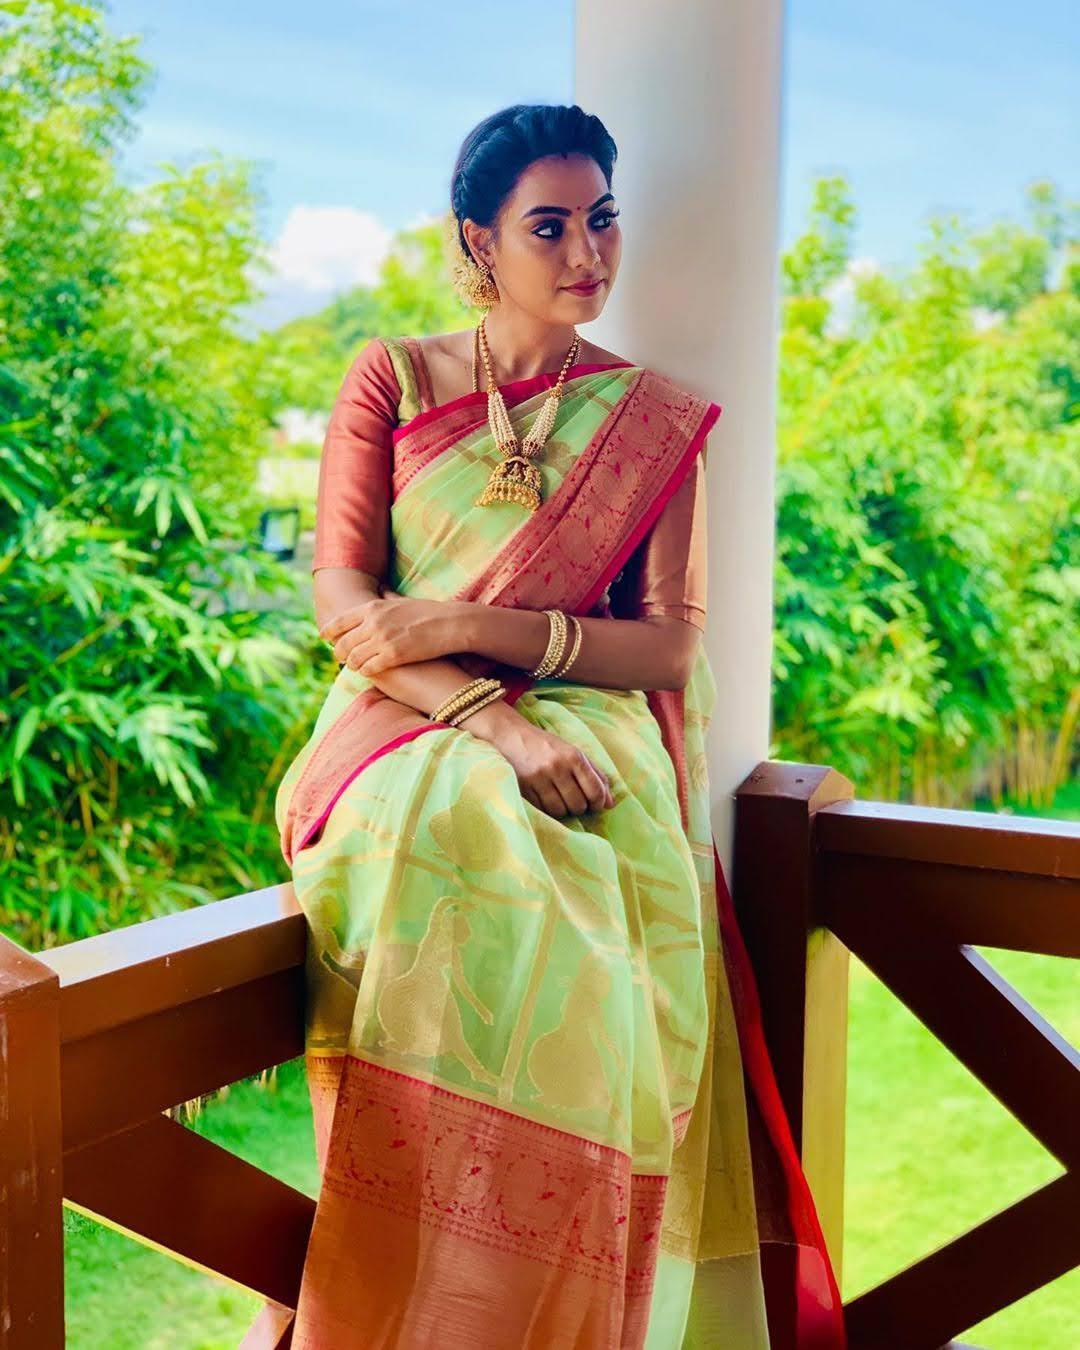 pavithra-janani-64701